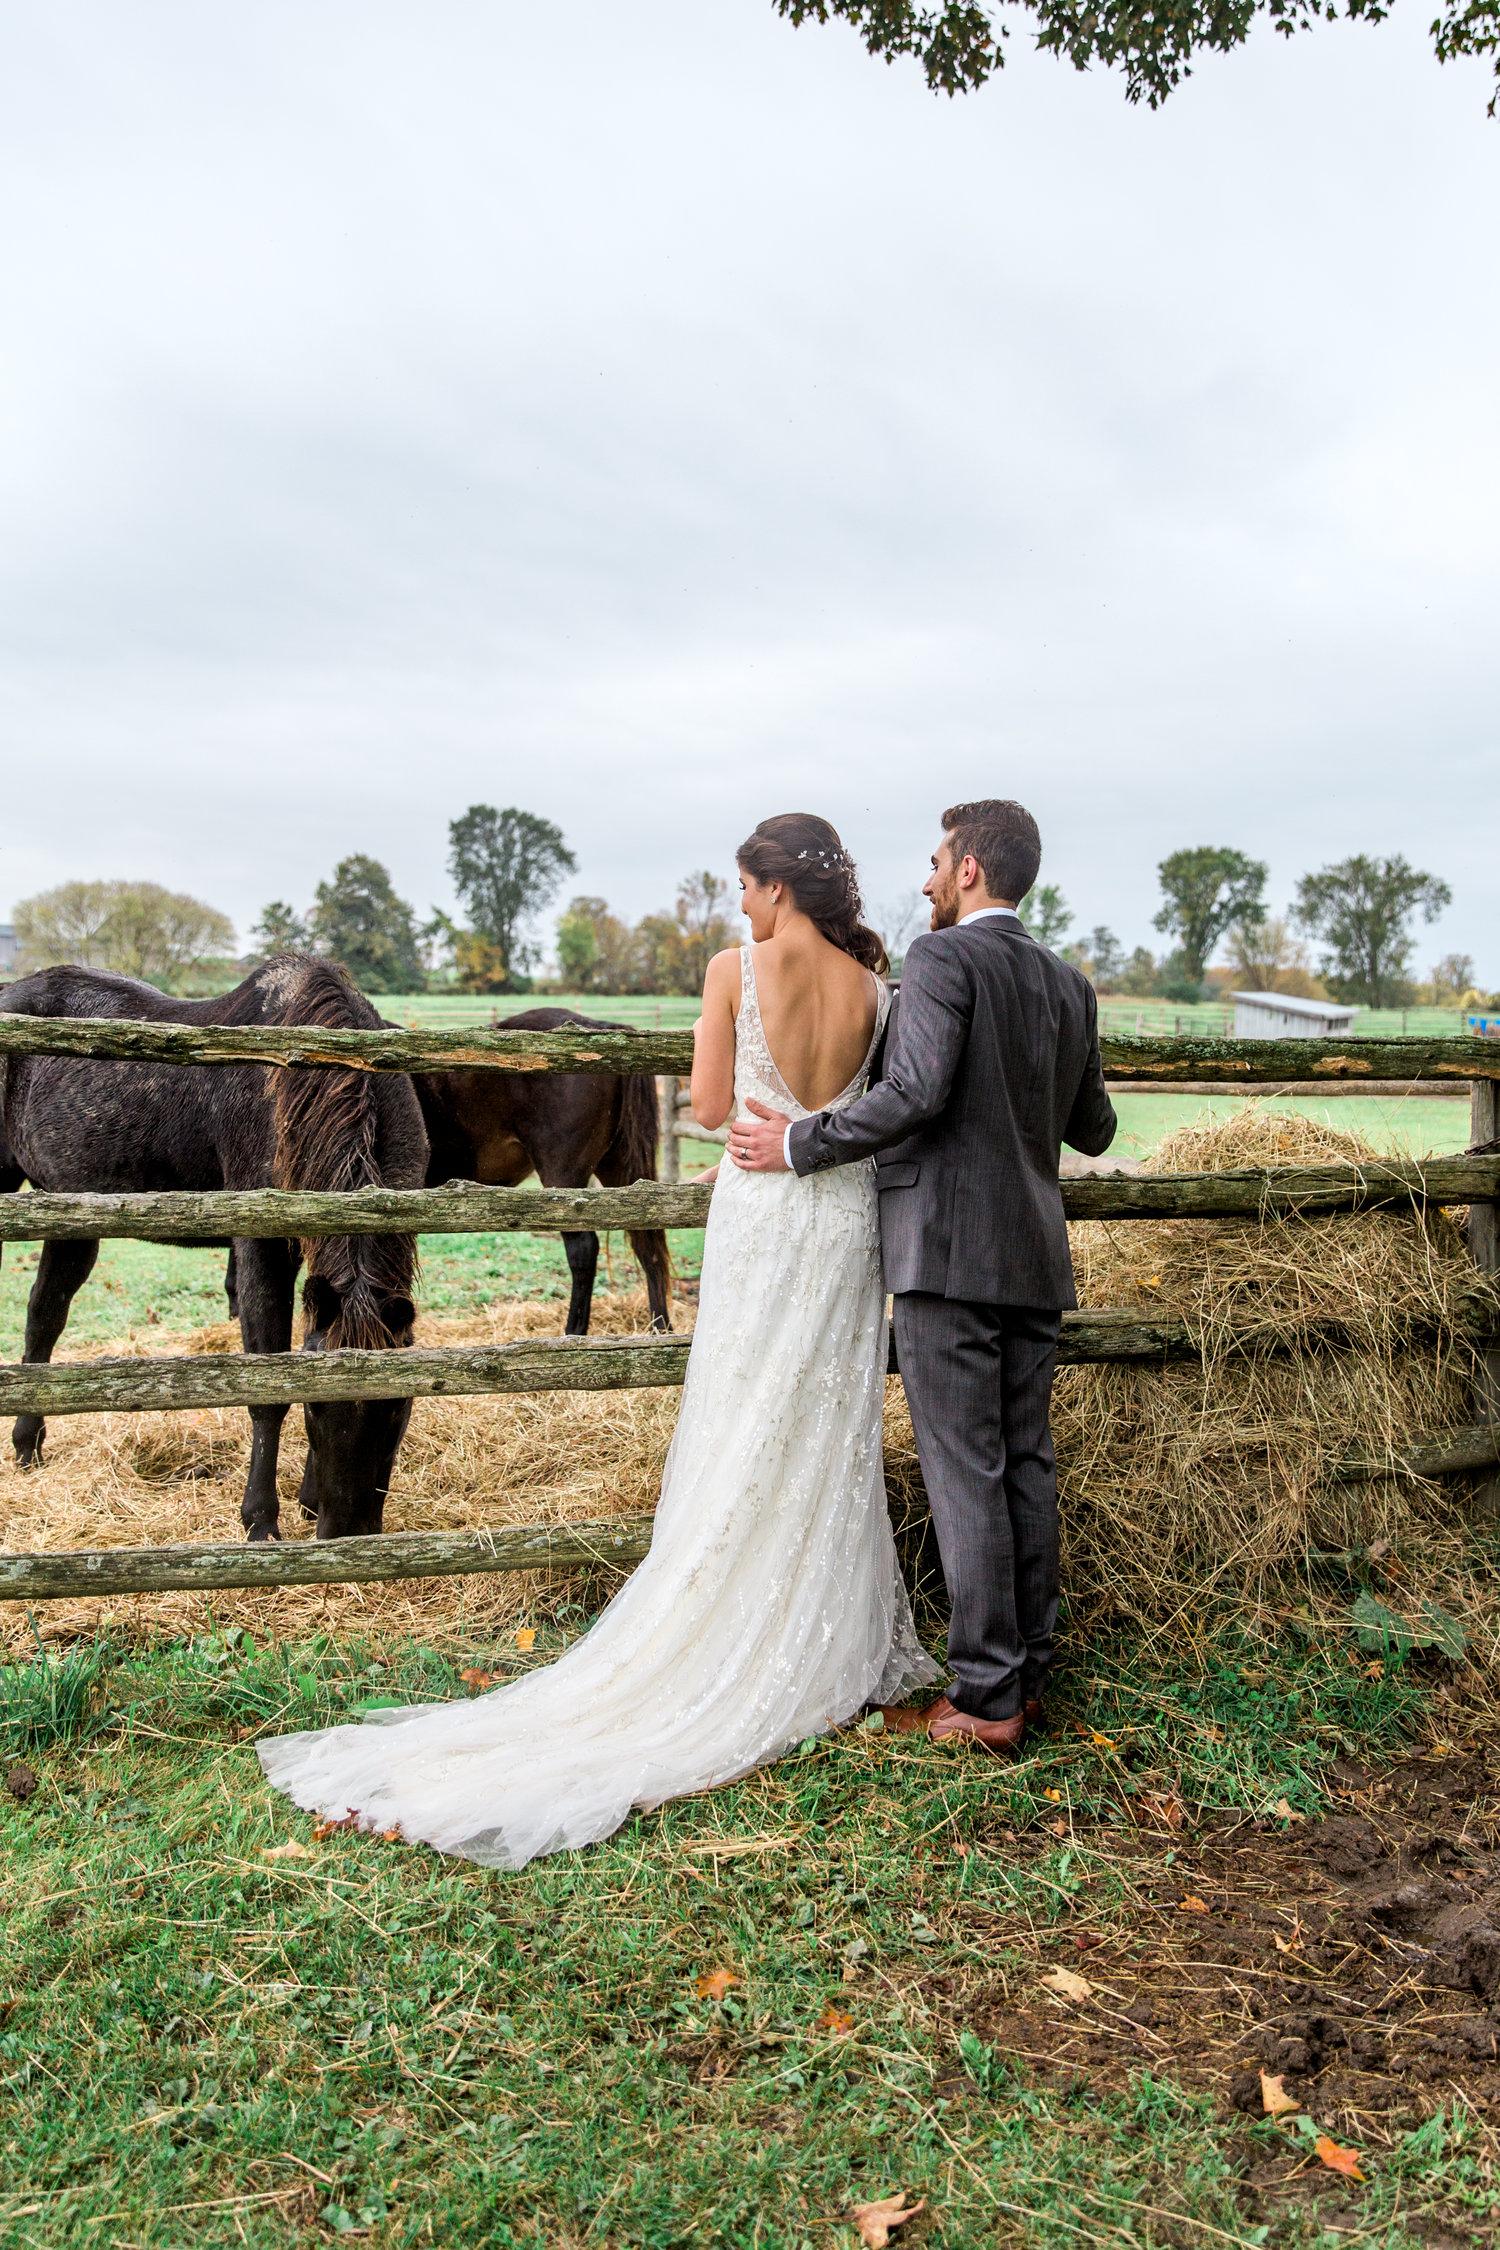 Amir-Golbazi-Danielle-Giroux-Photography_Toronto-Wedding_Cedarwood_Rachel-Paul_481.jpg